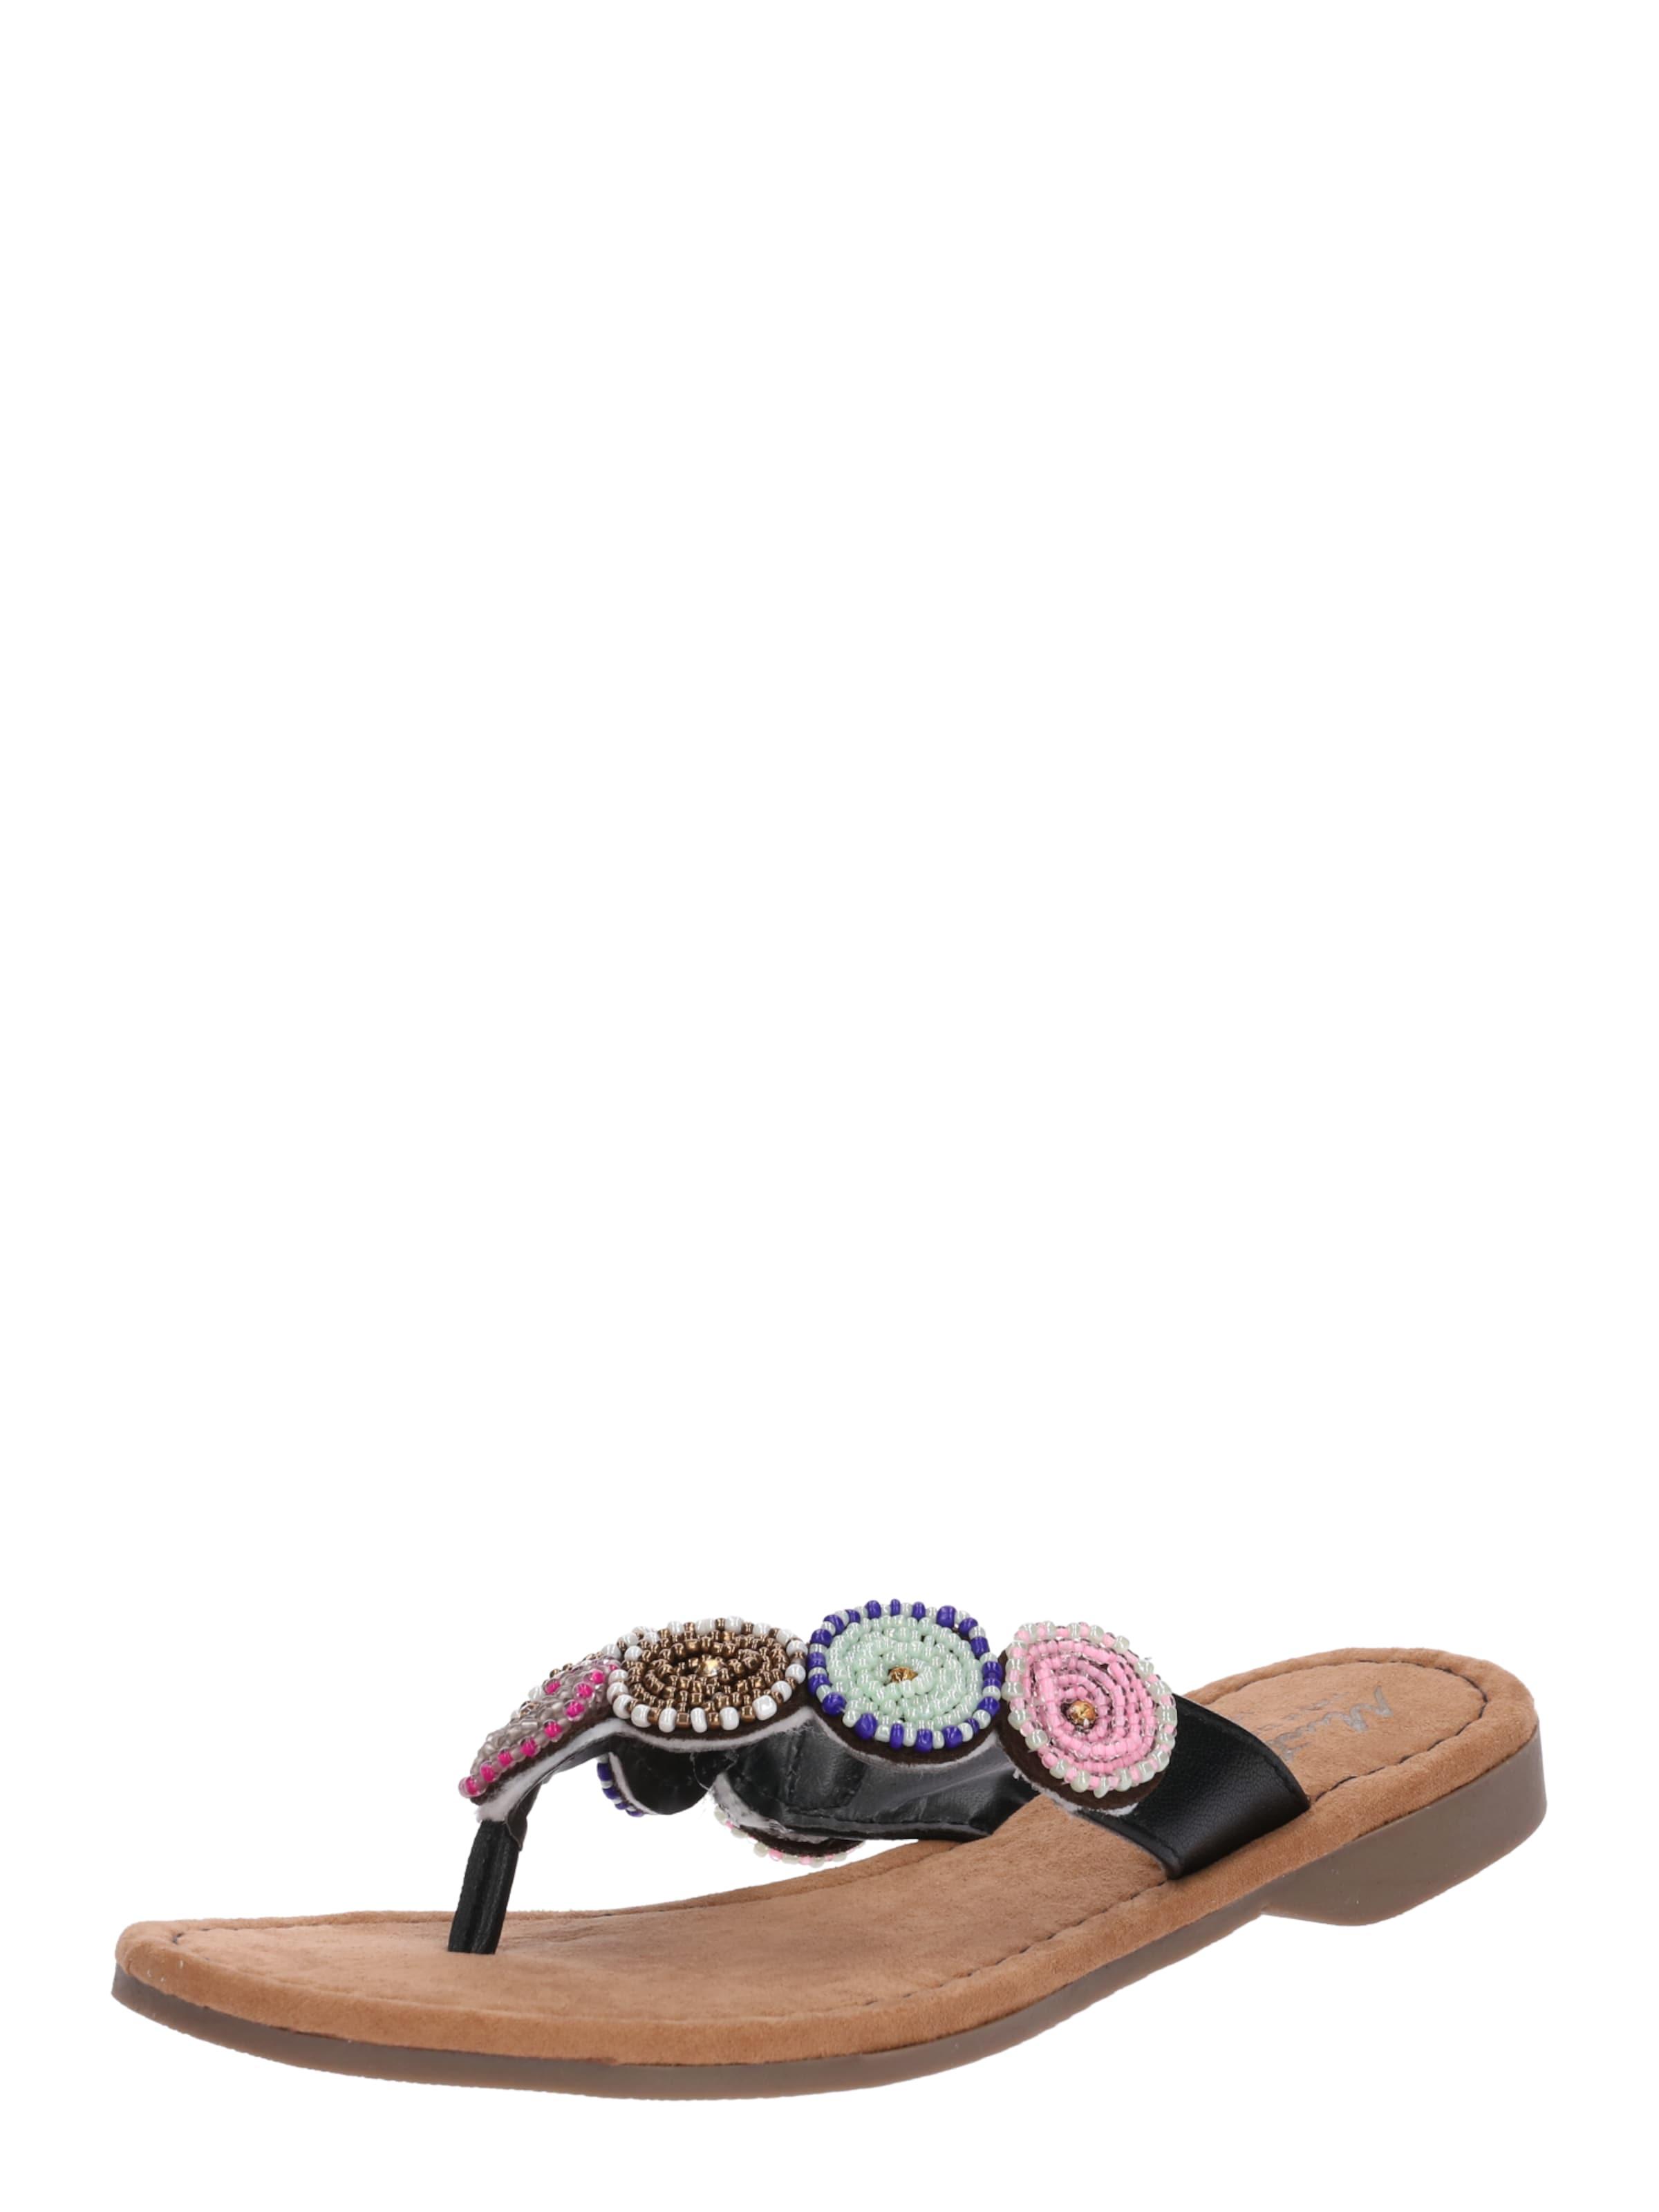 Haltbare Mode billige Schuhe MUSTANG | Zehentrenner Schuhe Schuhe Zehentrenner Gut getragene Schuhe 6c9cde